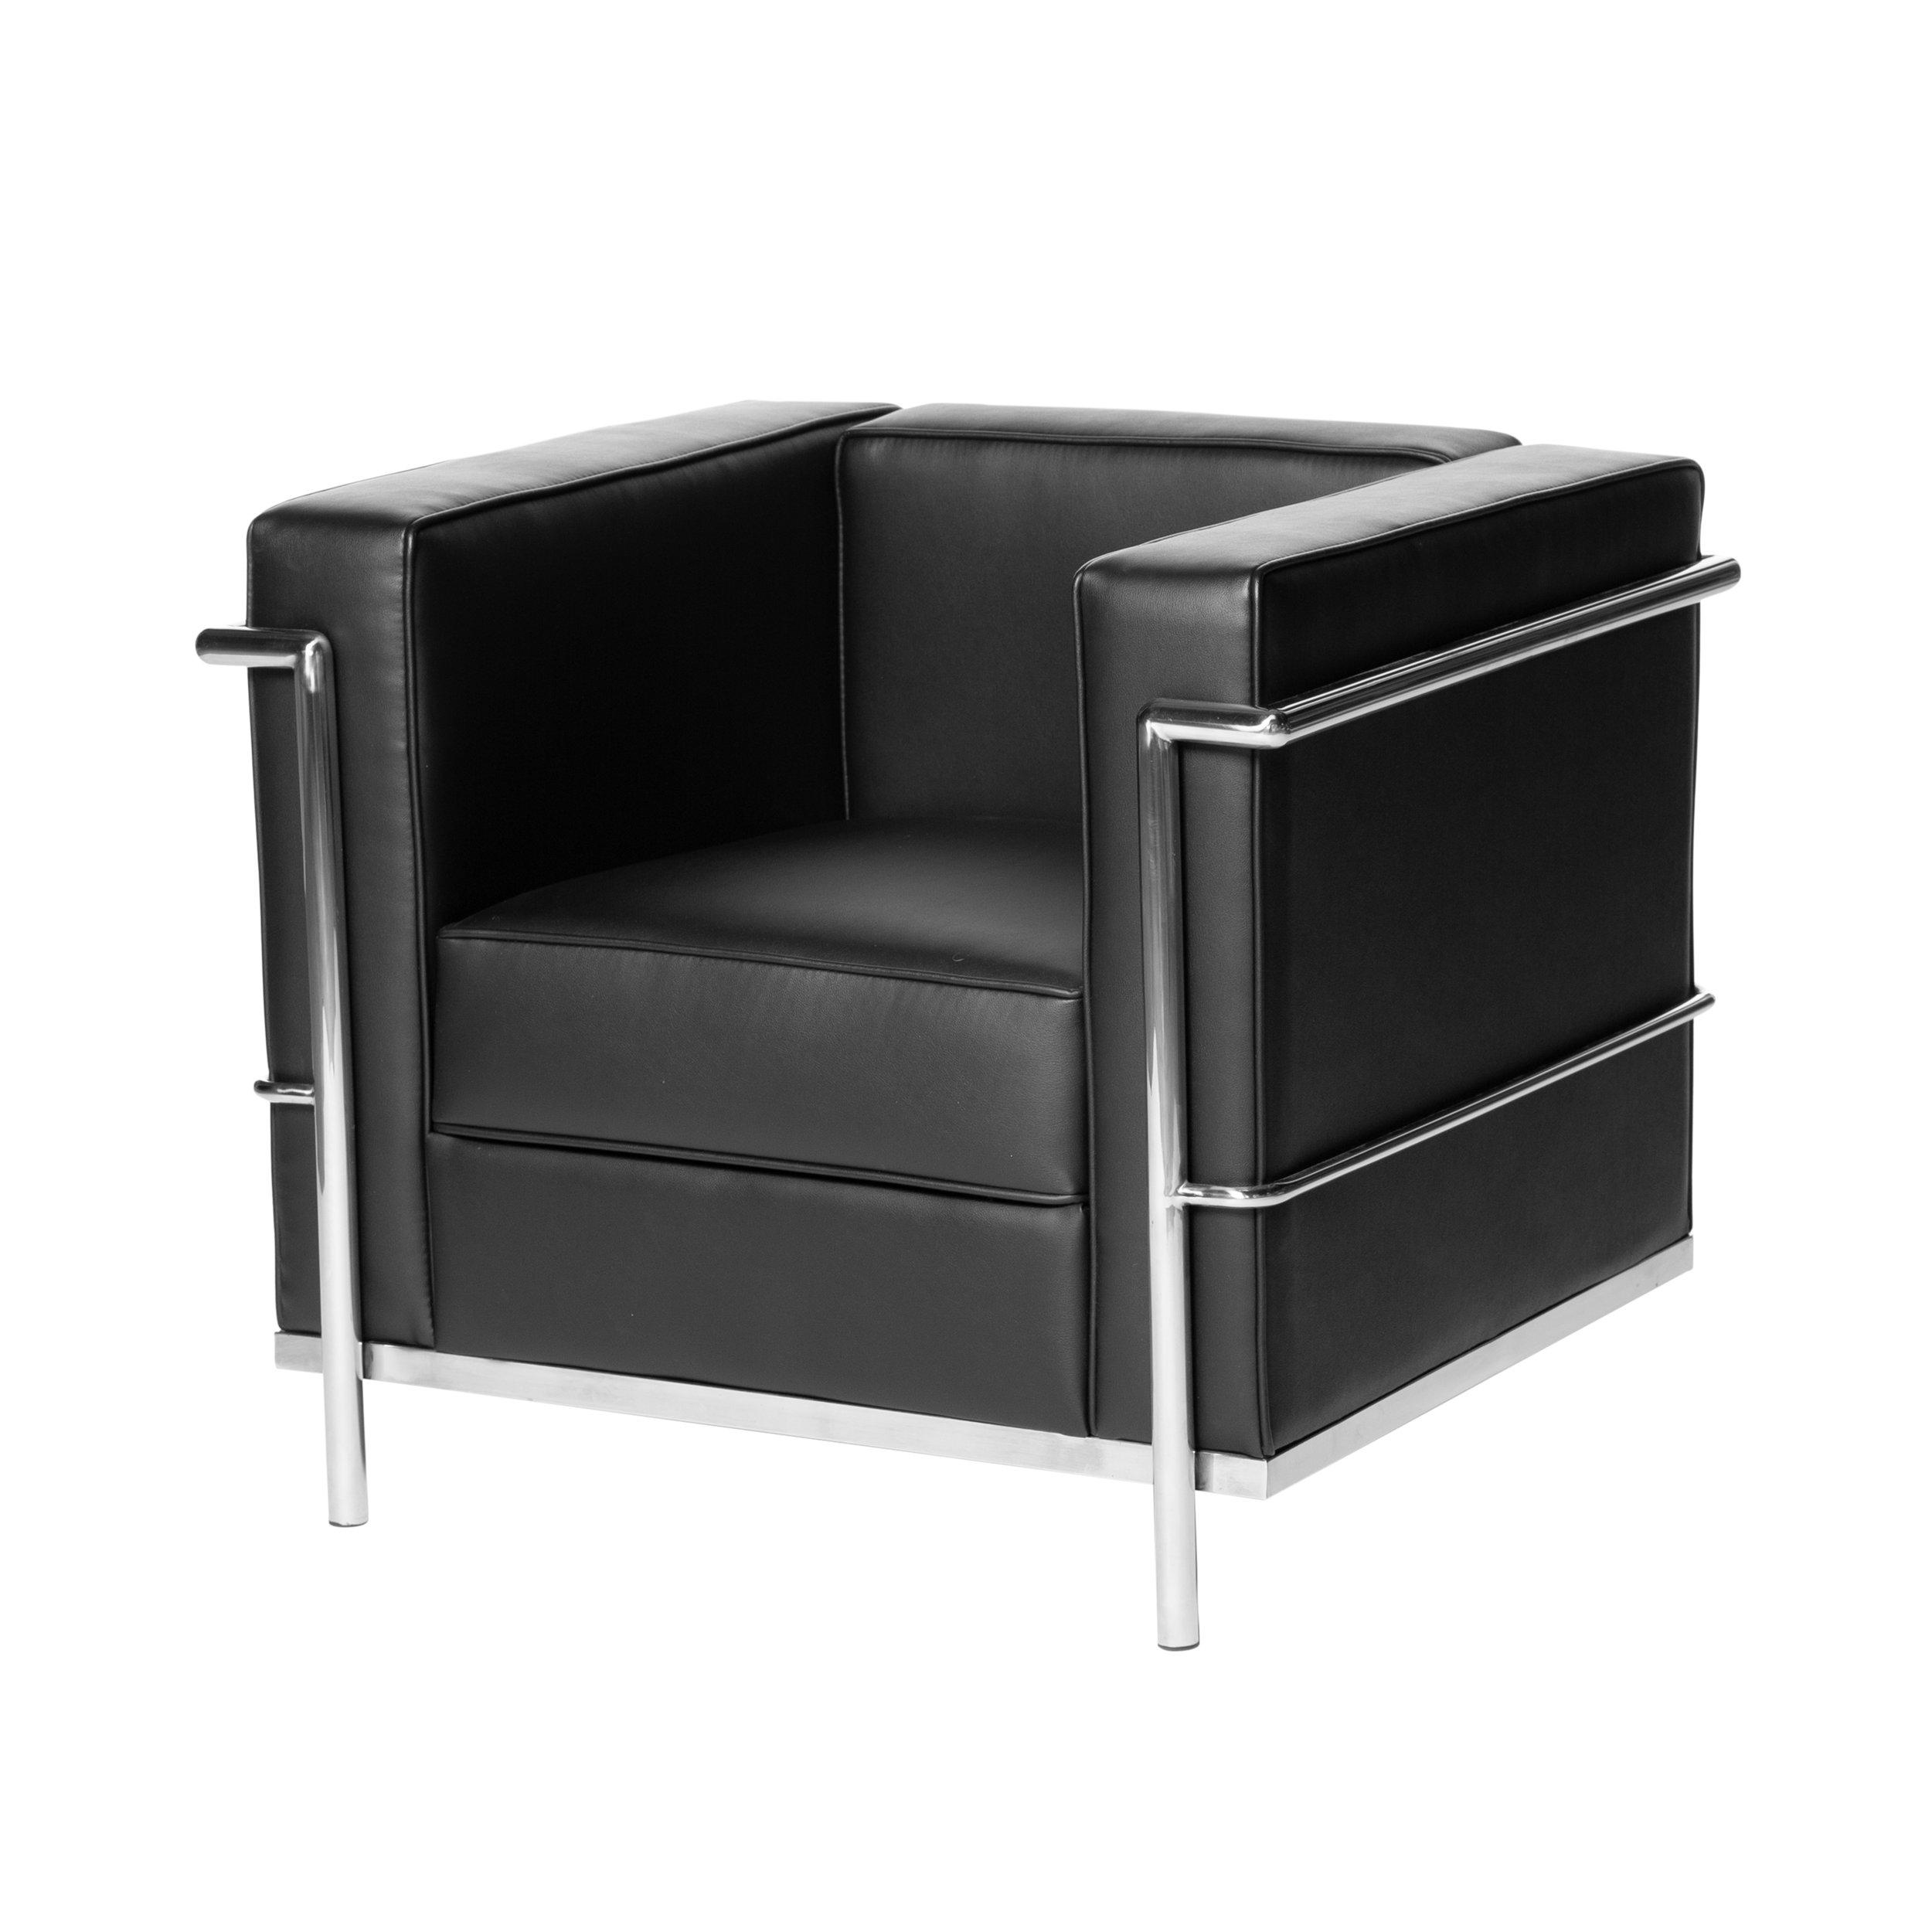 Leather Deco Club Chair - $200 | QTY: 8